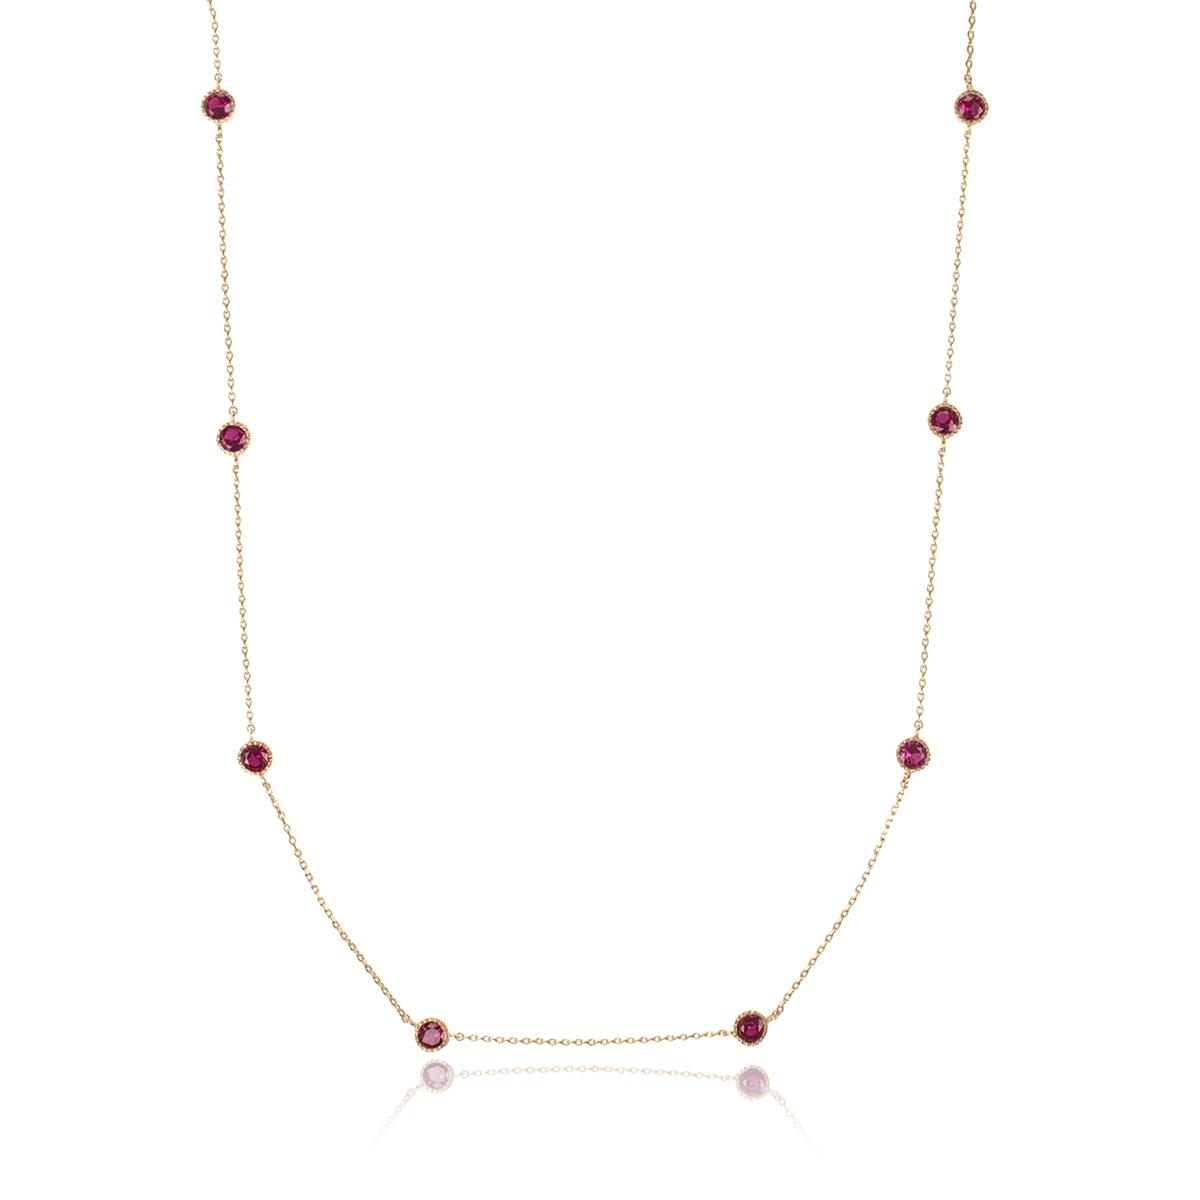 Colar Longo de Zircônia Rubi Redonda Semijoia em Ouro 18K  - Soloyou